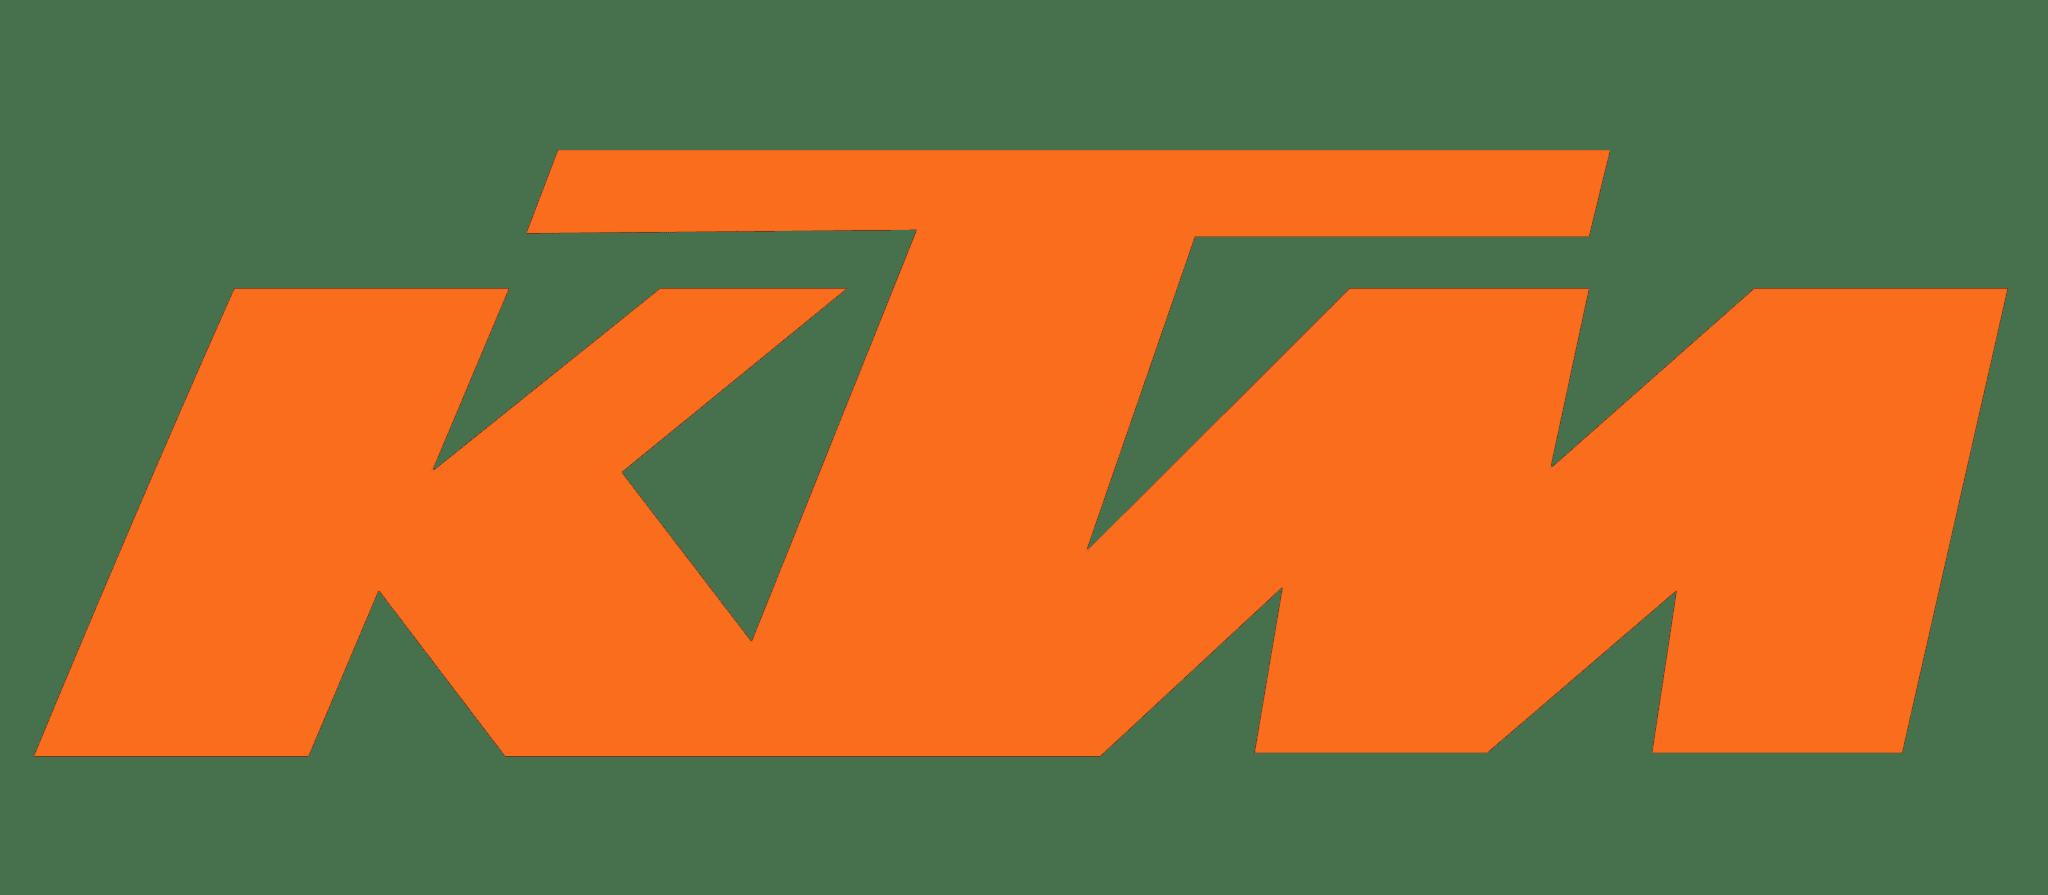 KTM-Logo-Design-Vector-Free-Download copy